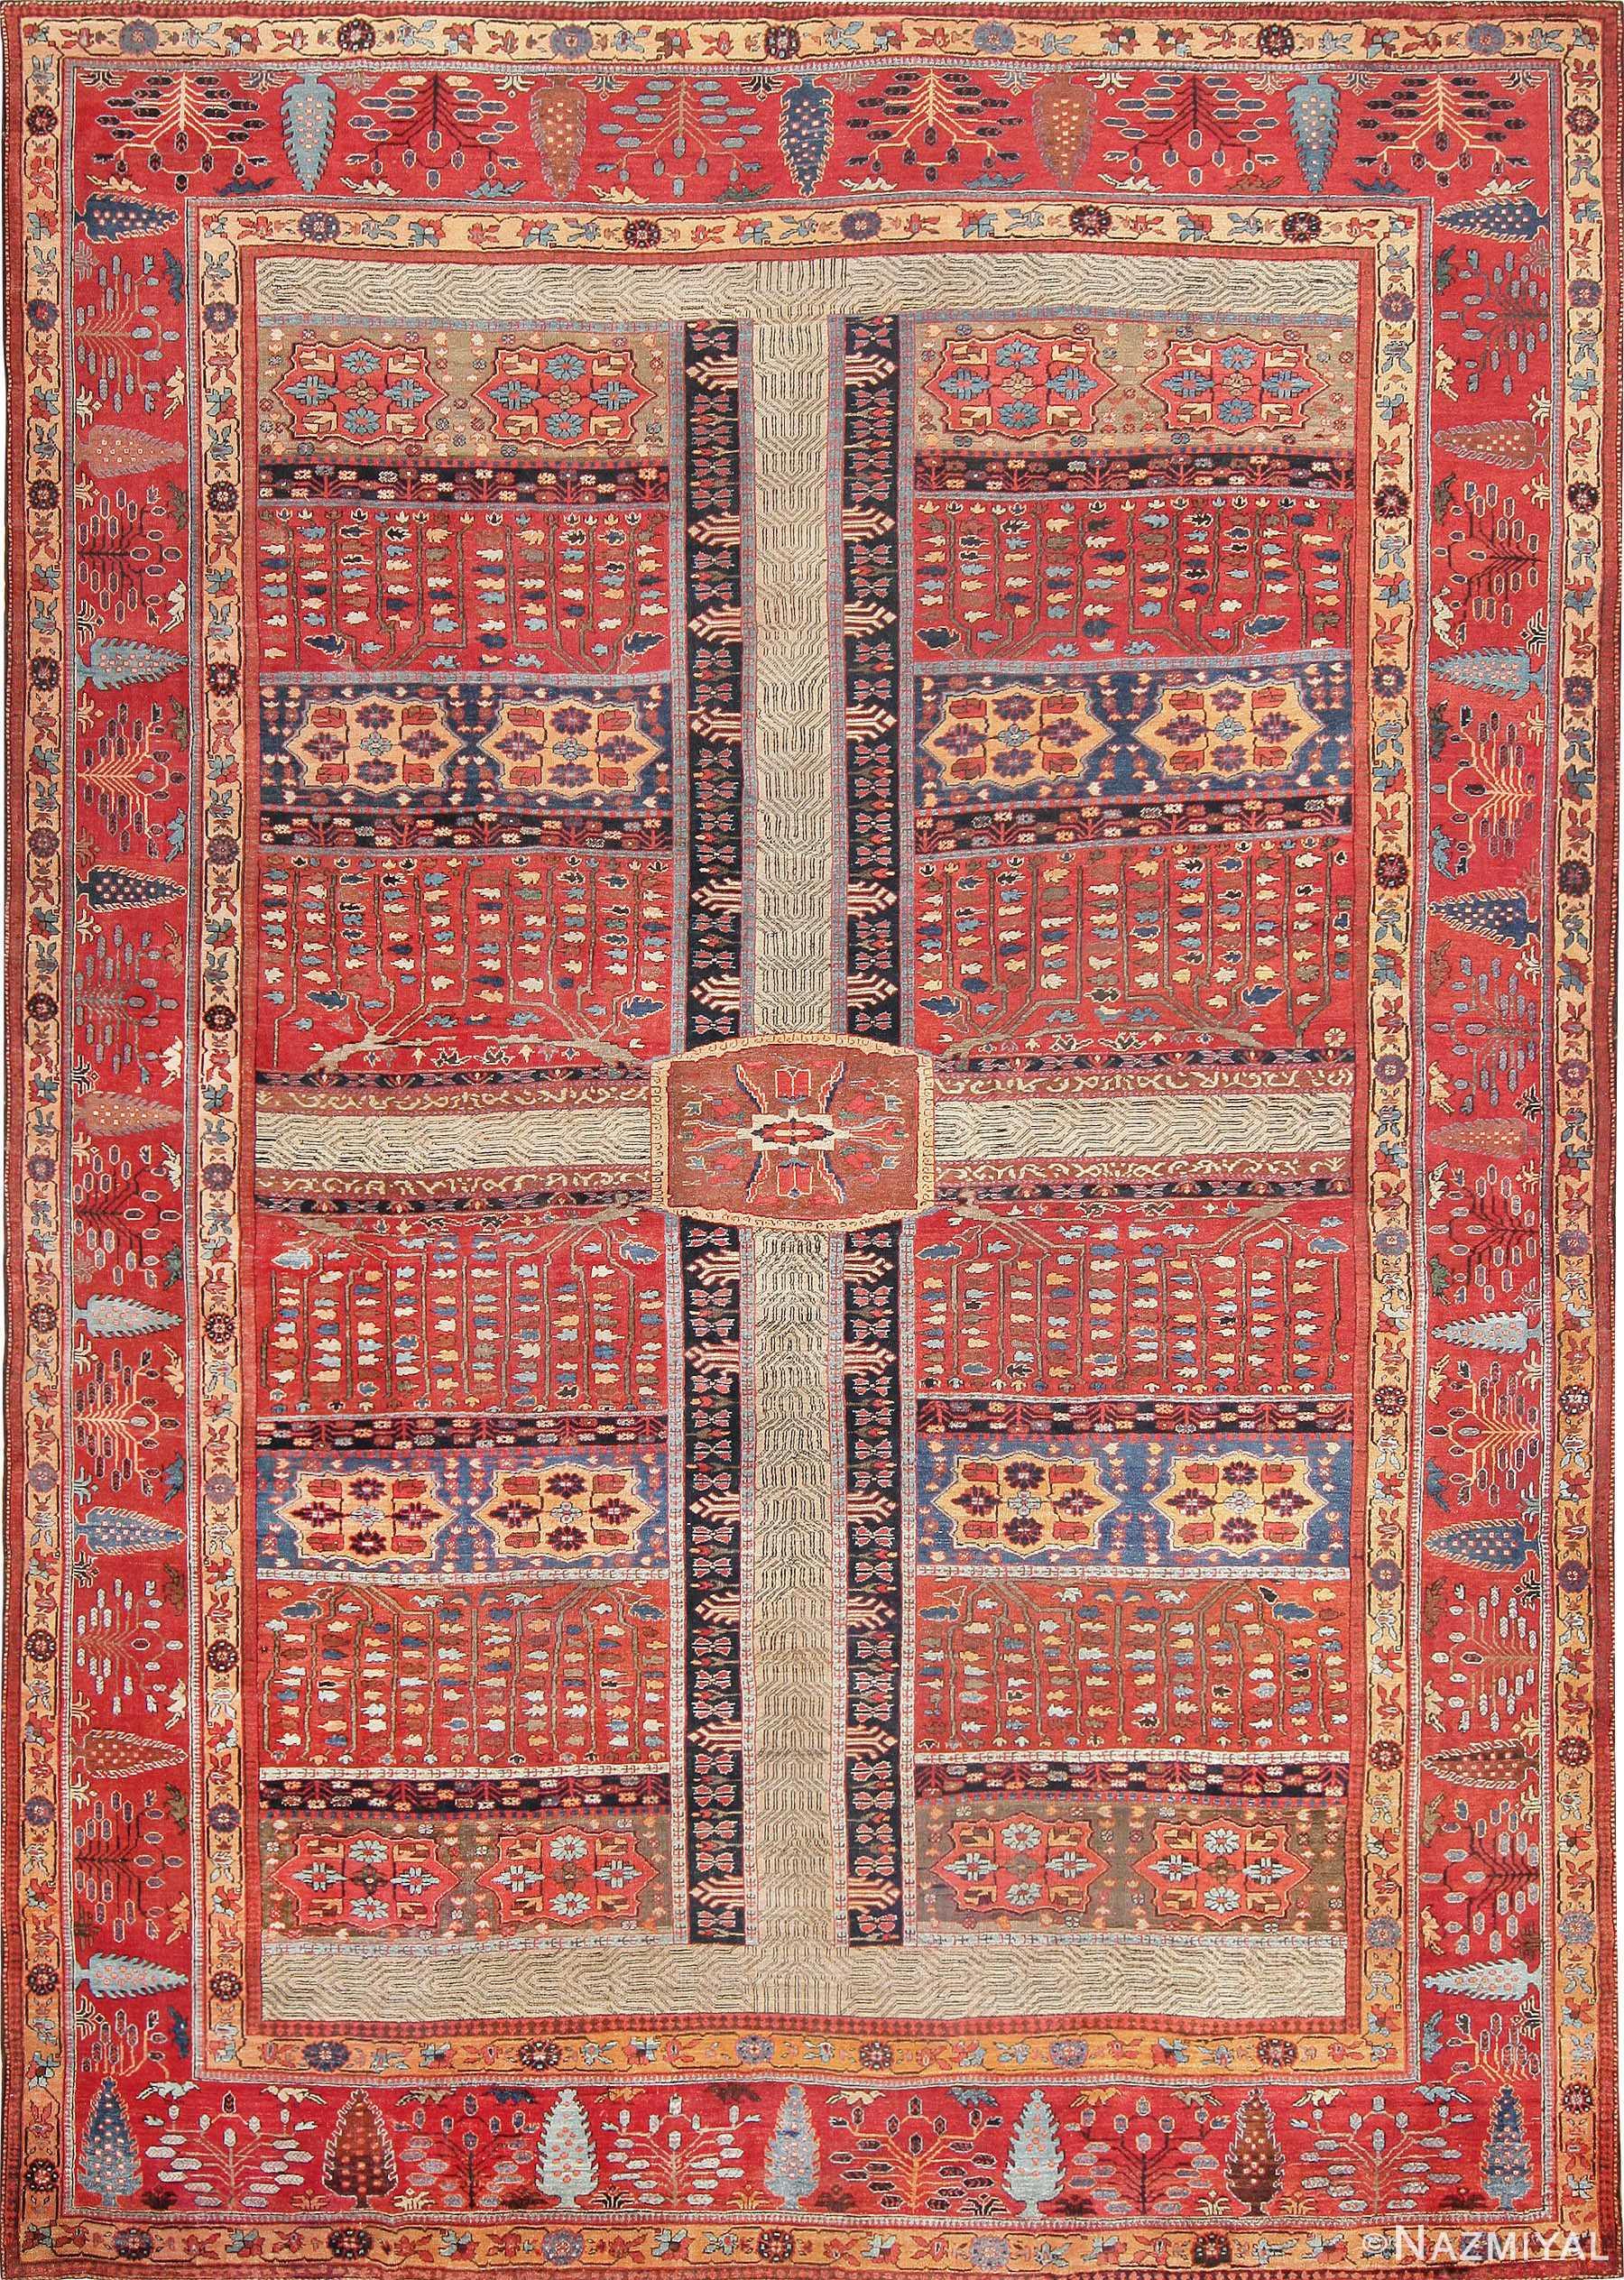 Large Antique Persian Bakshaish Carpet 47269 by Nazmiyal